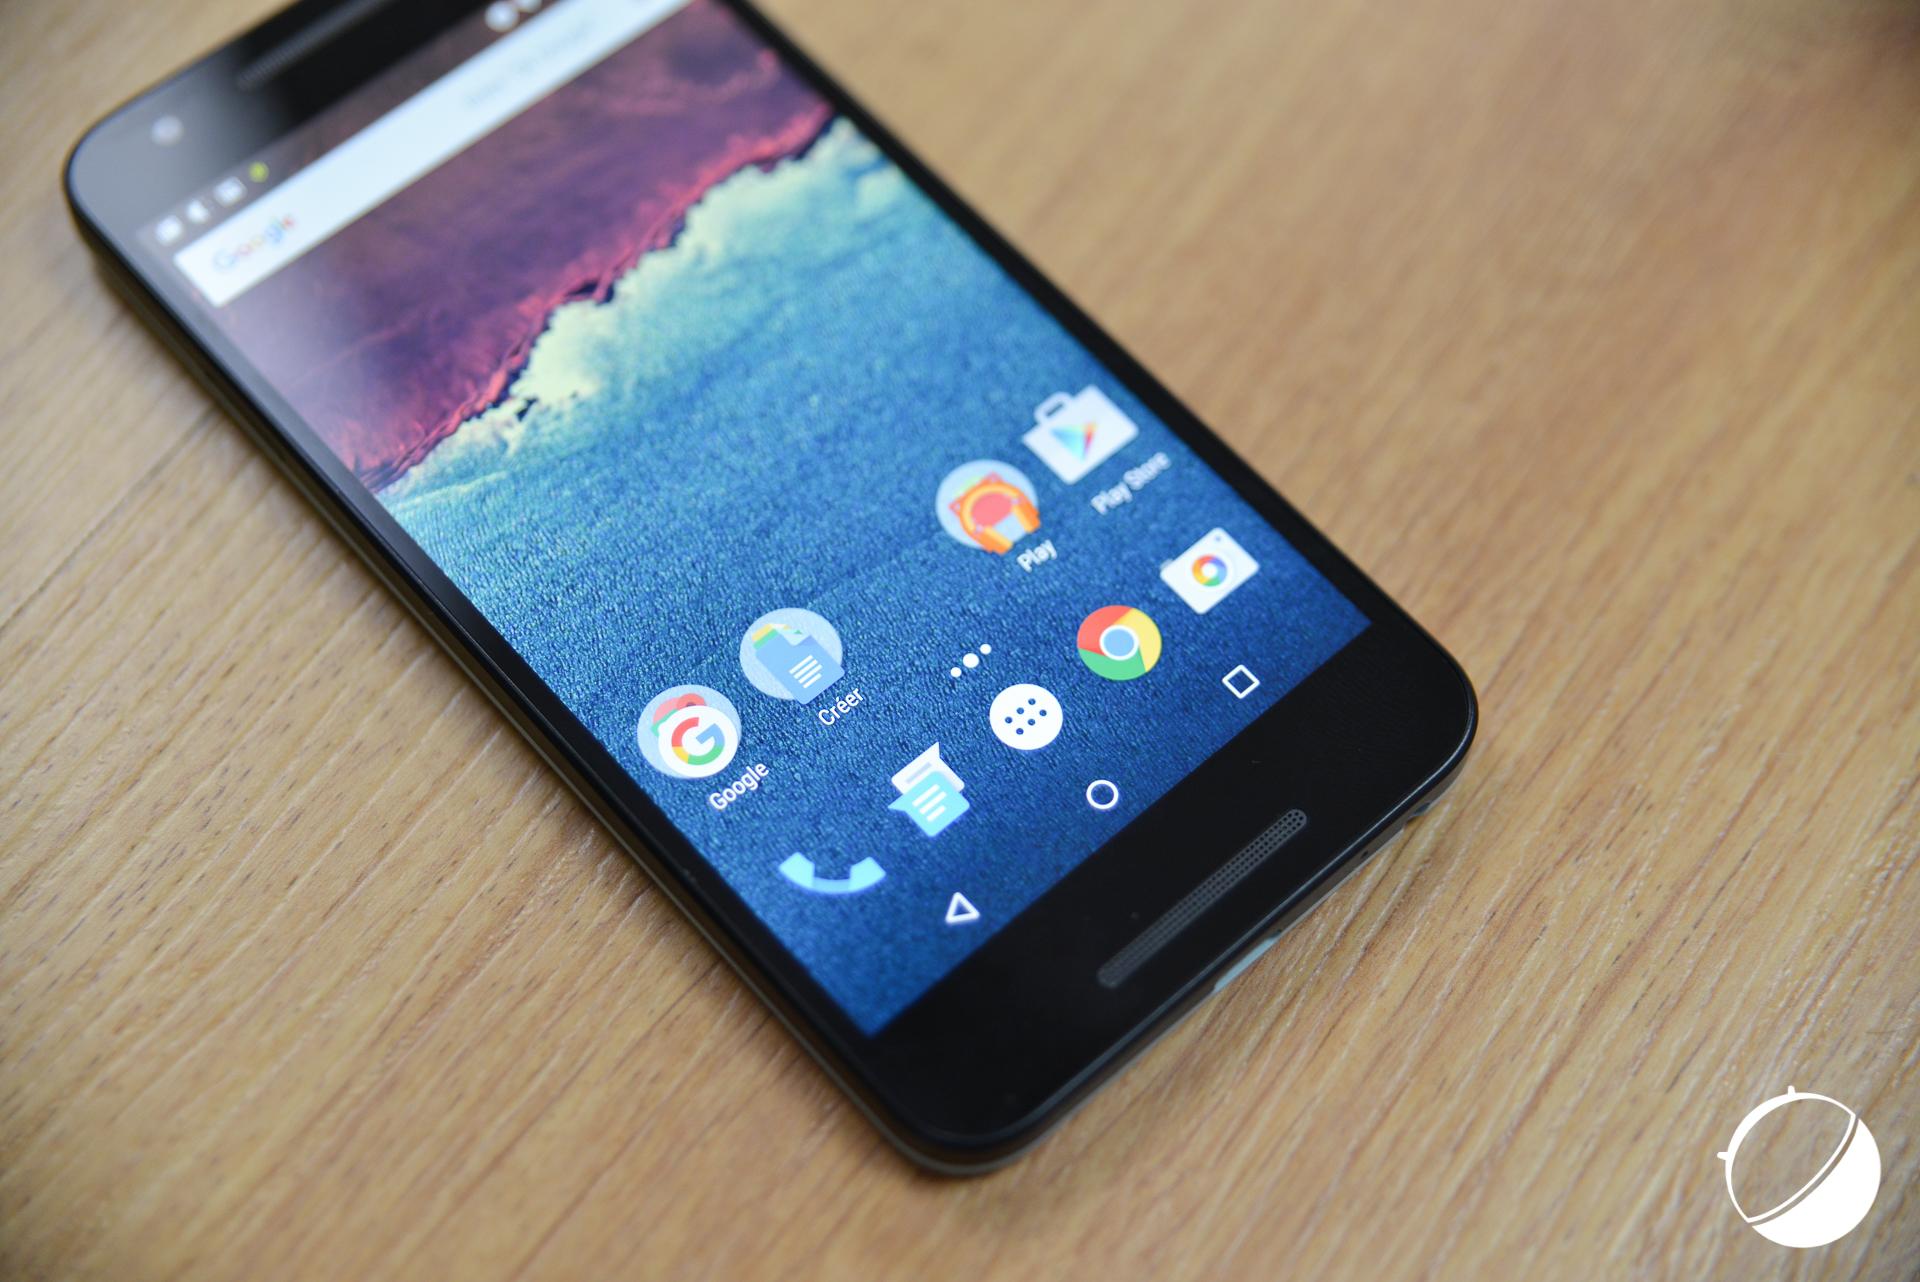 Google Phone 7.0 permet de rejeter les appels entrants plus discrètement